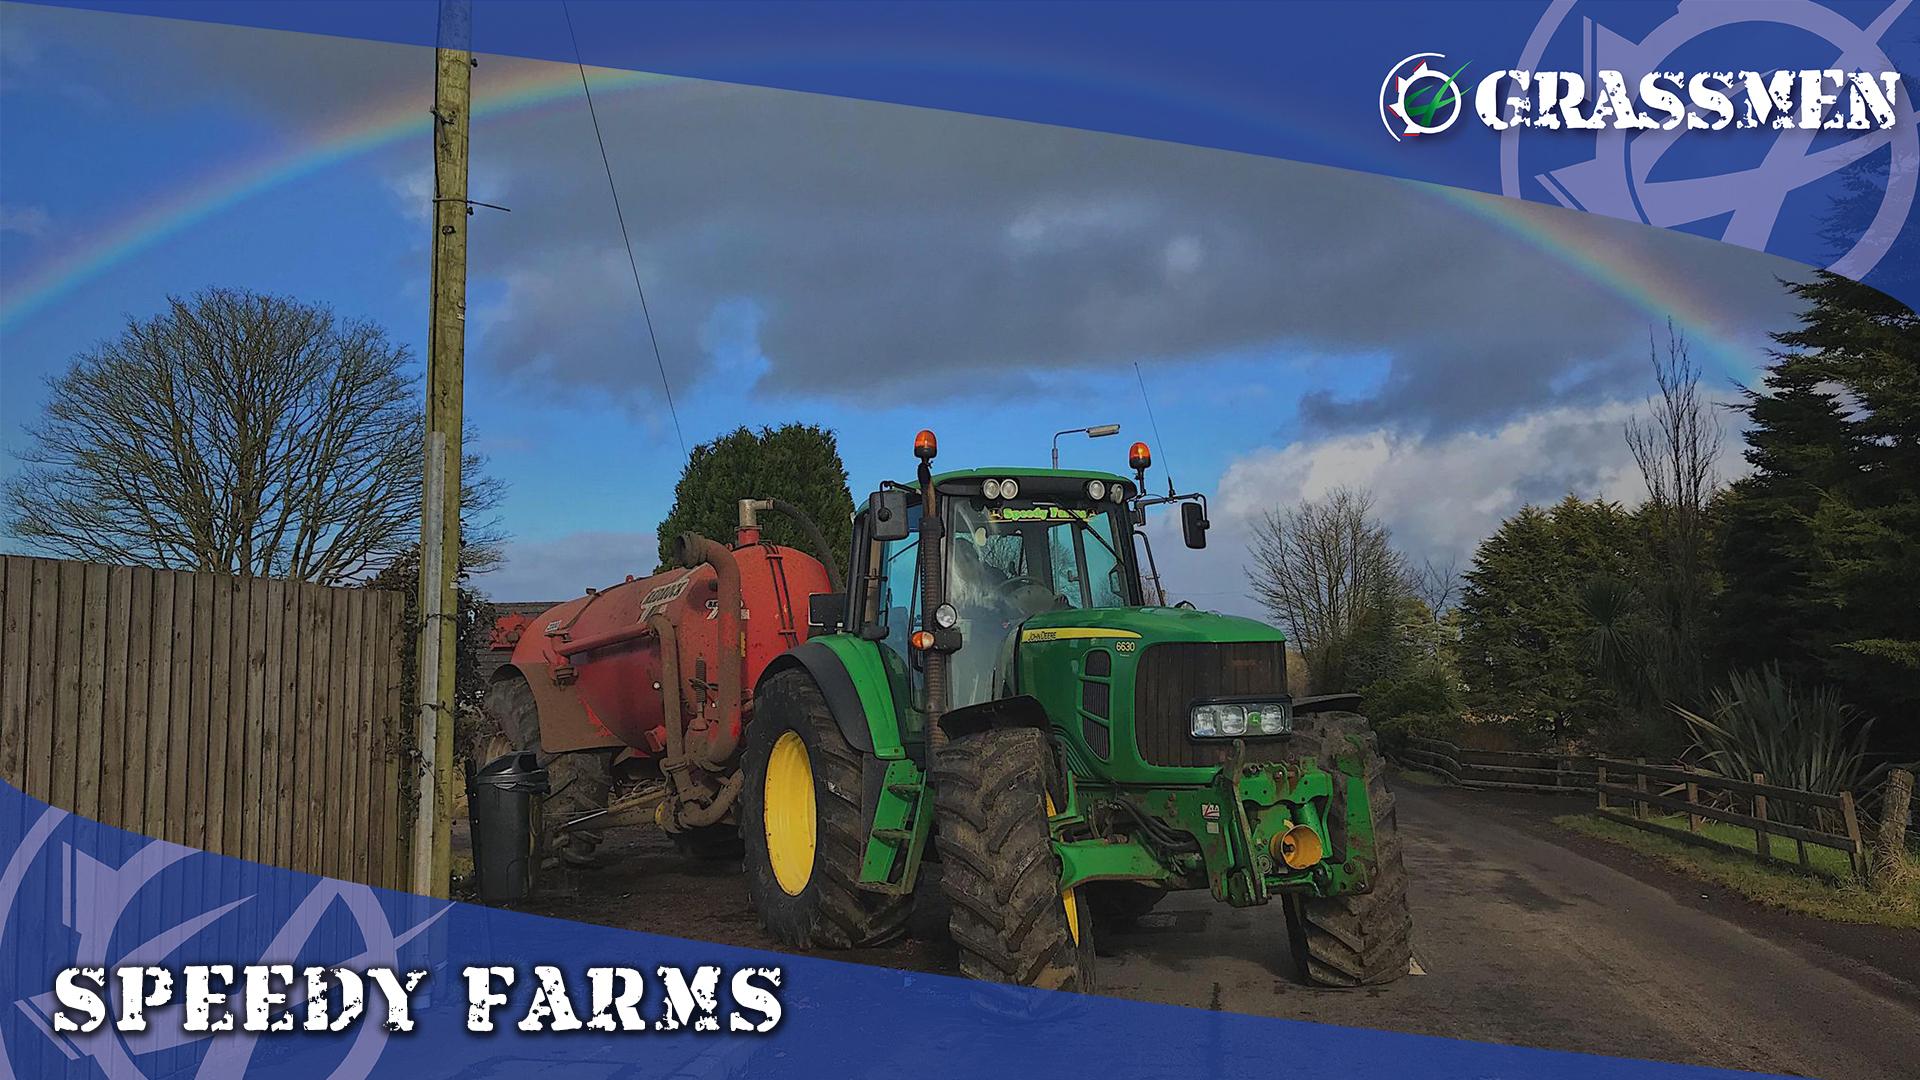 Speedy Farms Slurry